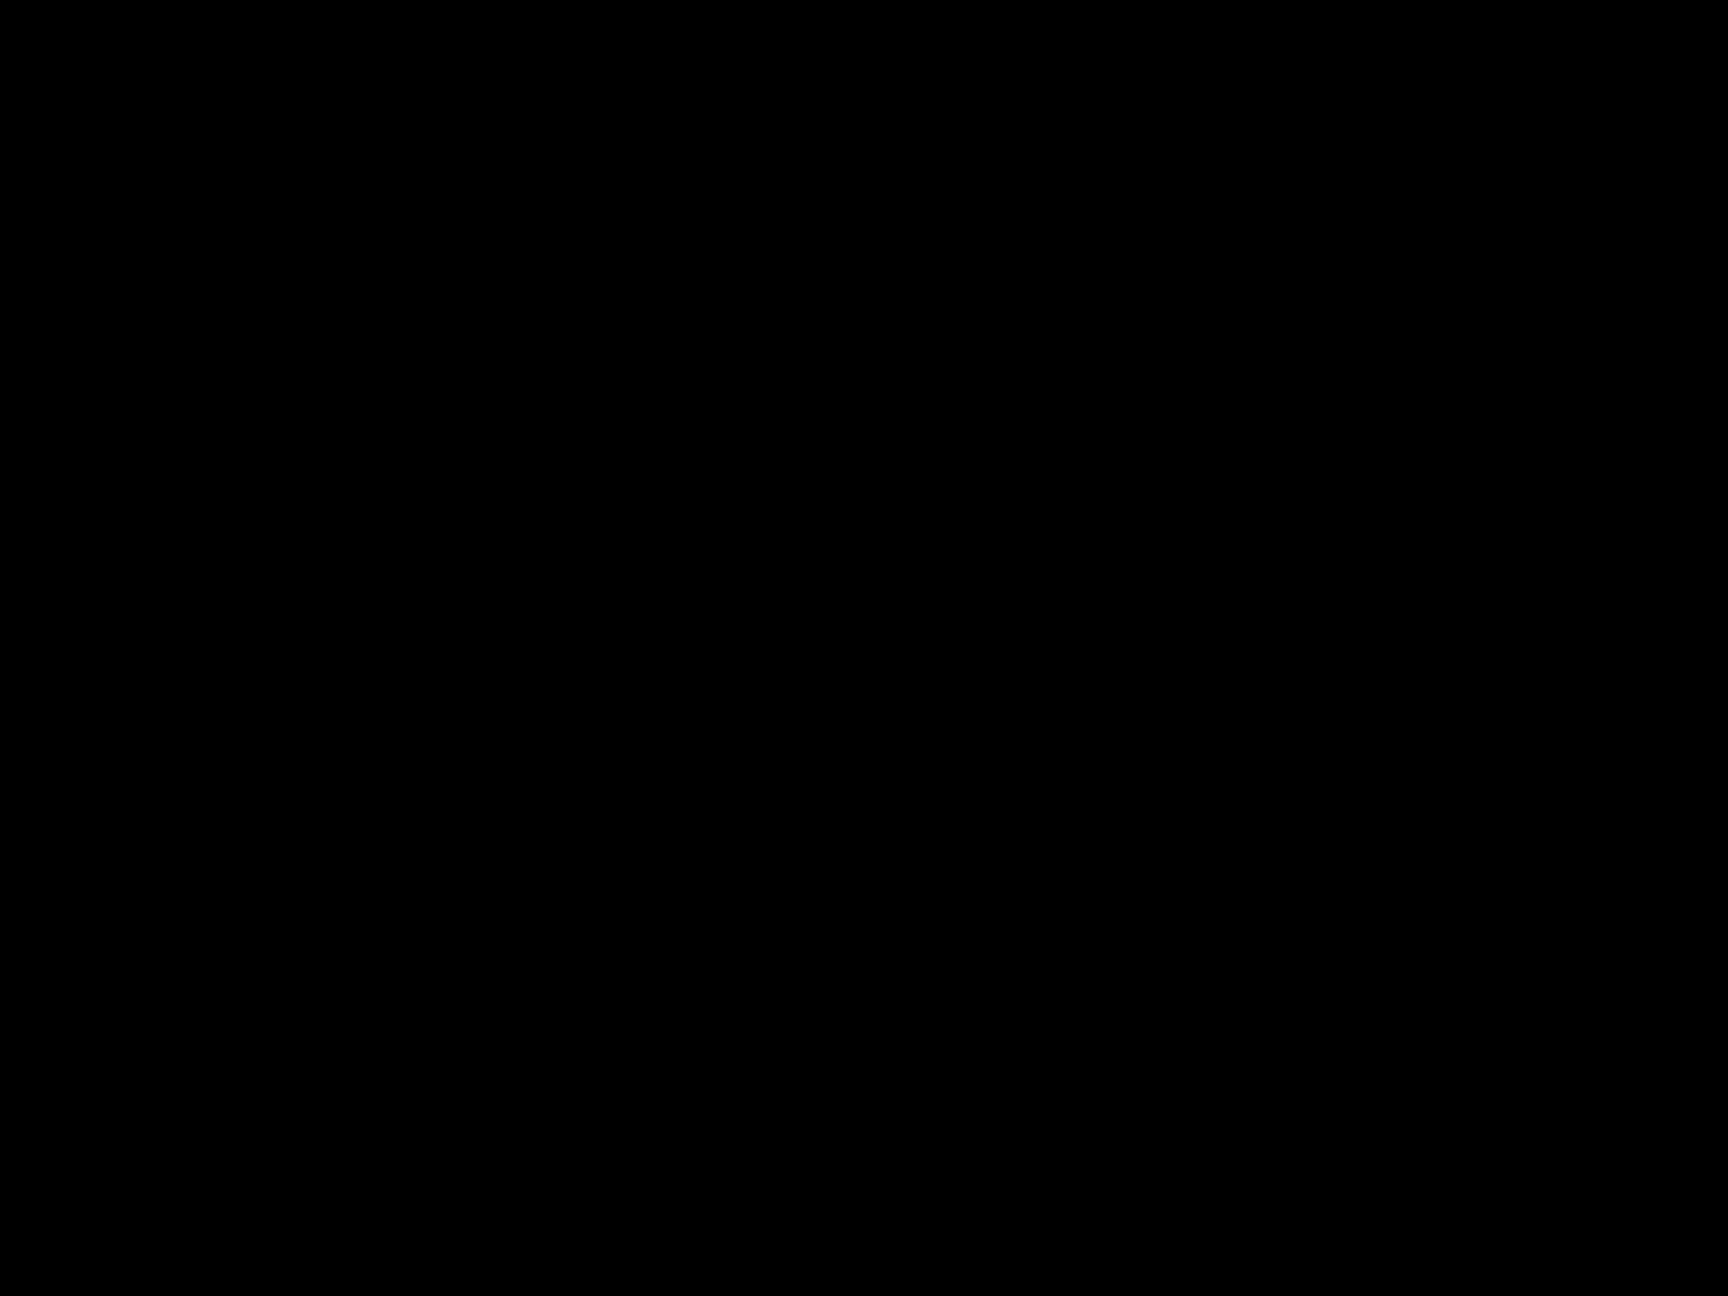 CHC Bázis-Rover